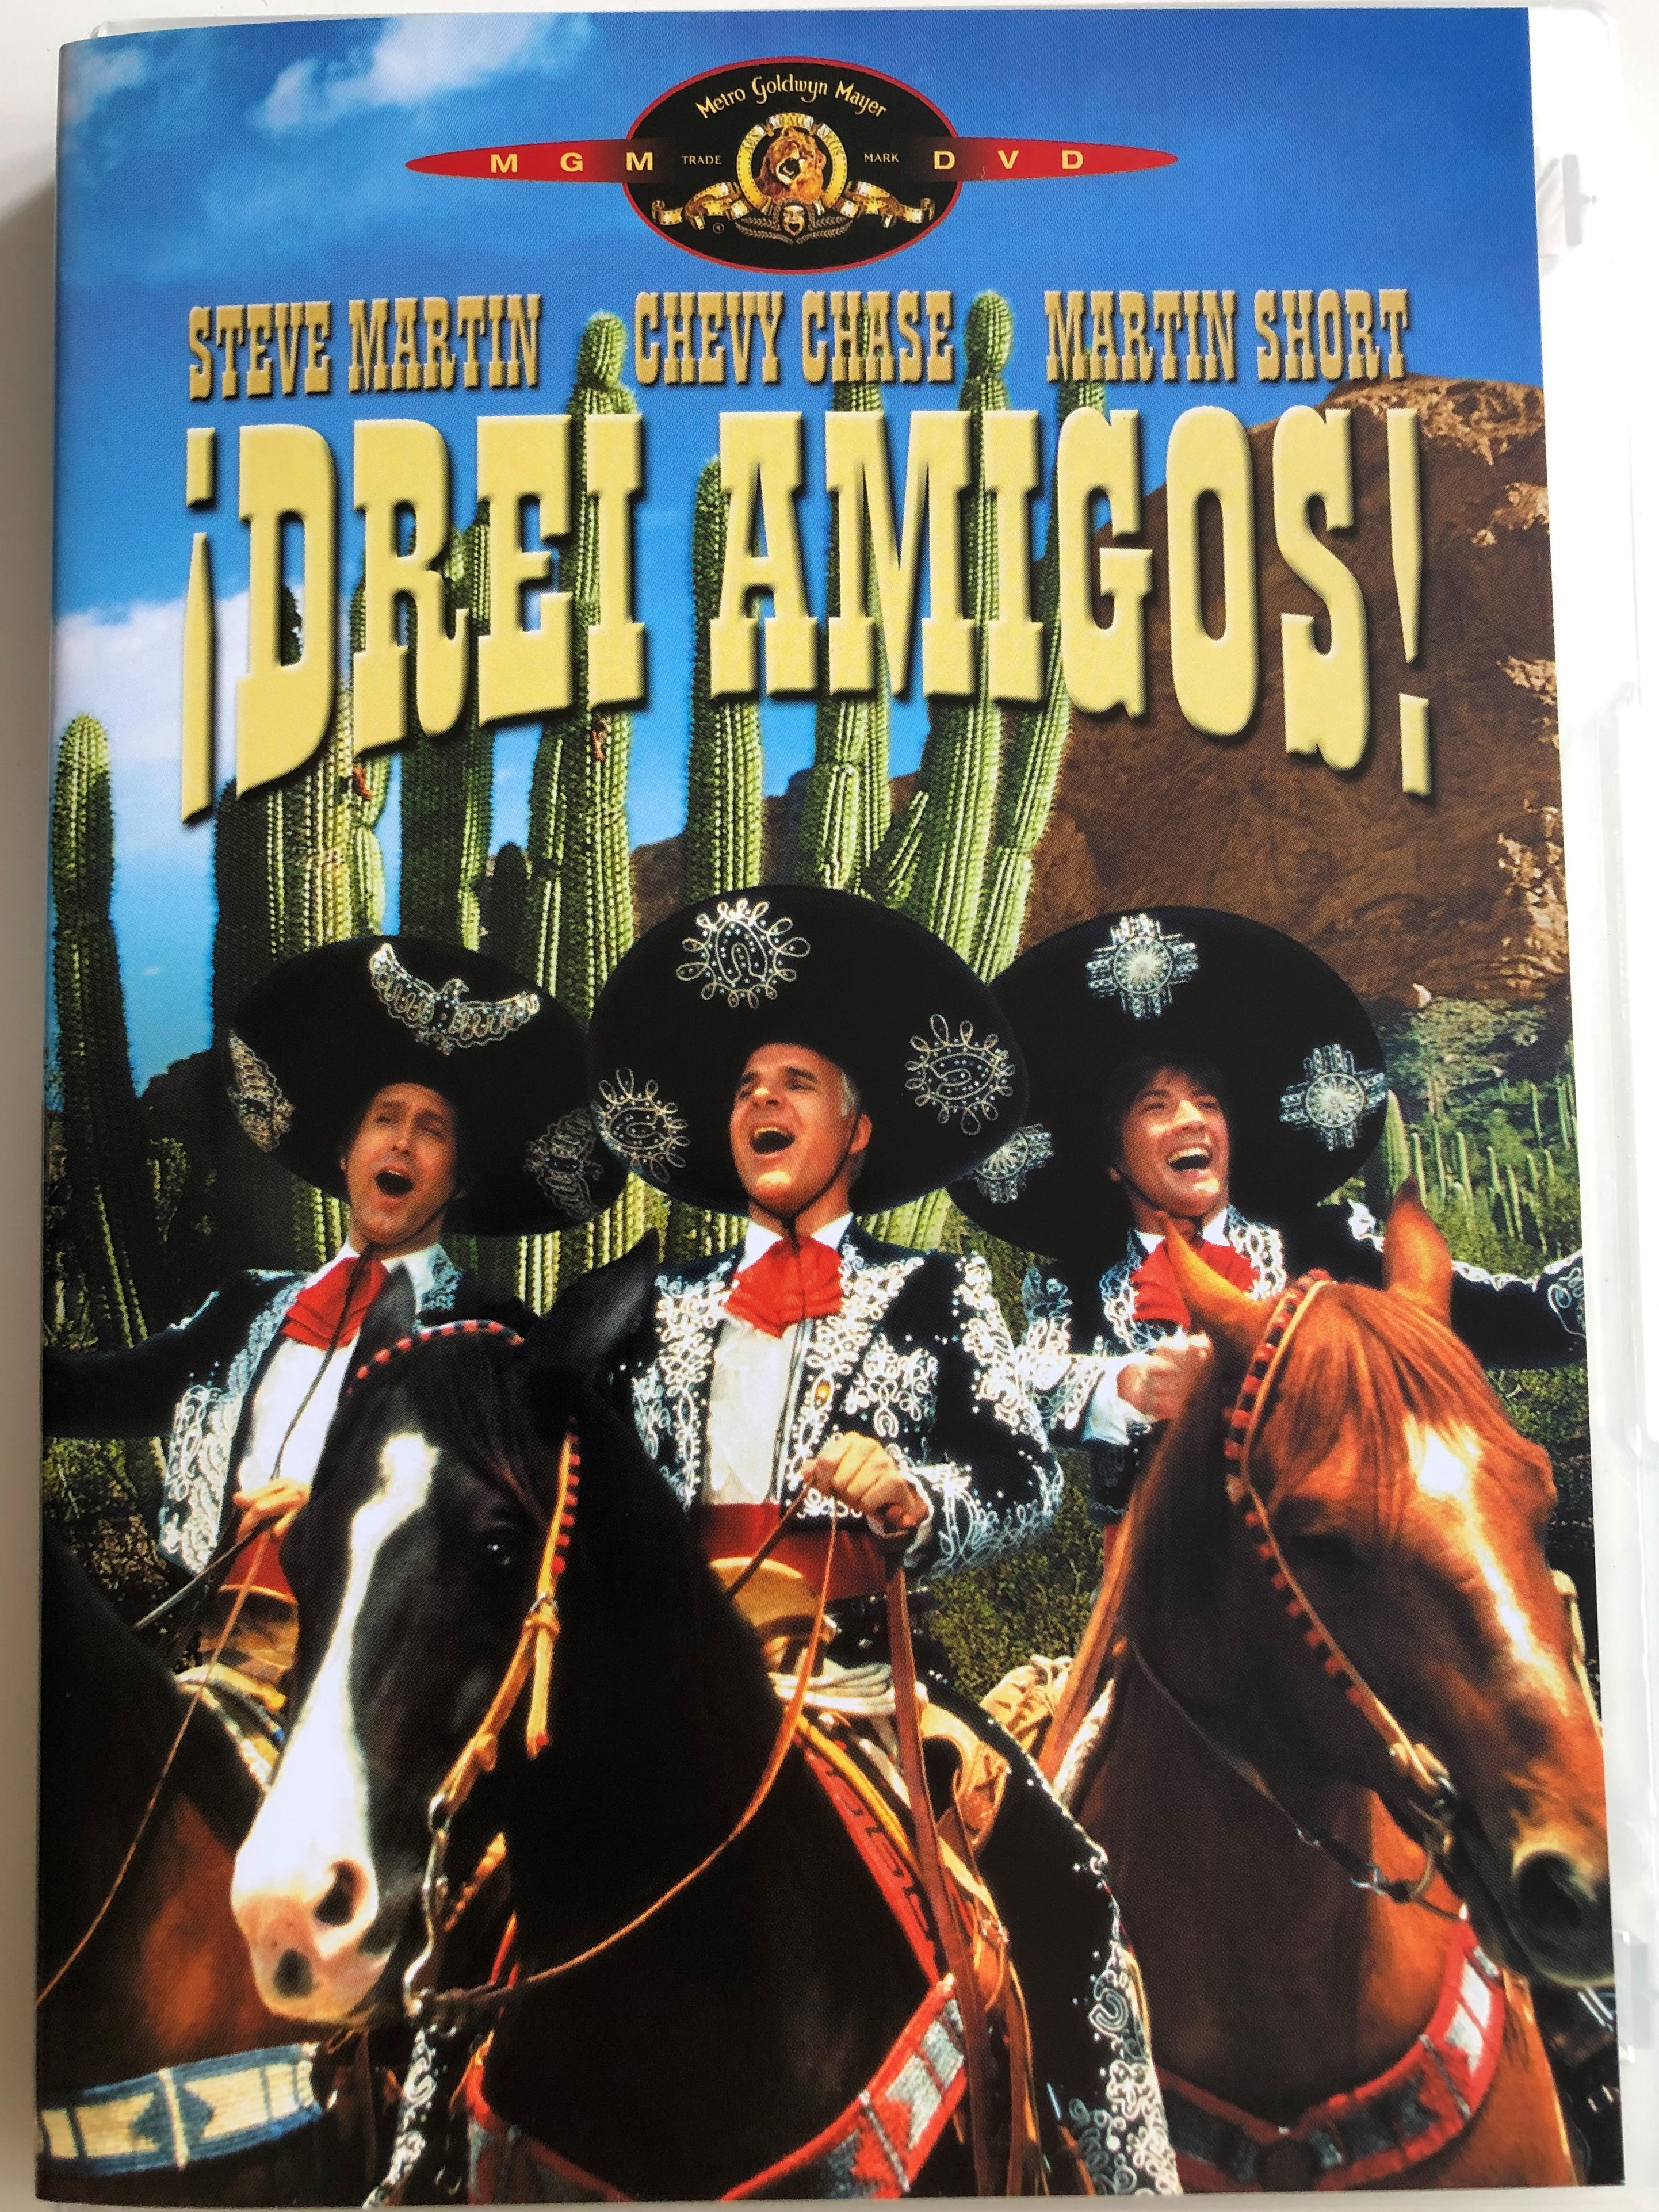 the-three-amigos-dvd-1986-drei-amigos-directed-by-john-landis-starring-steve-martin-chevy-chase-martin-short-alfonso-arau-1-.jpg